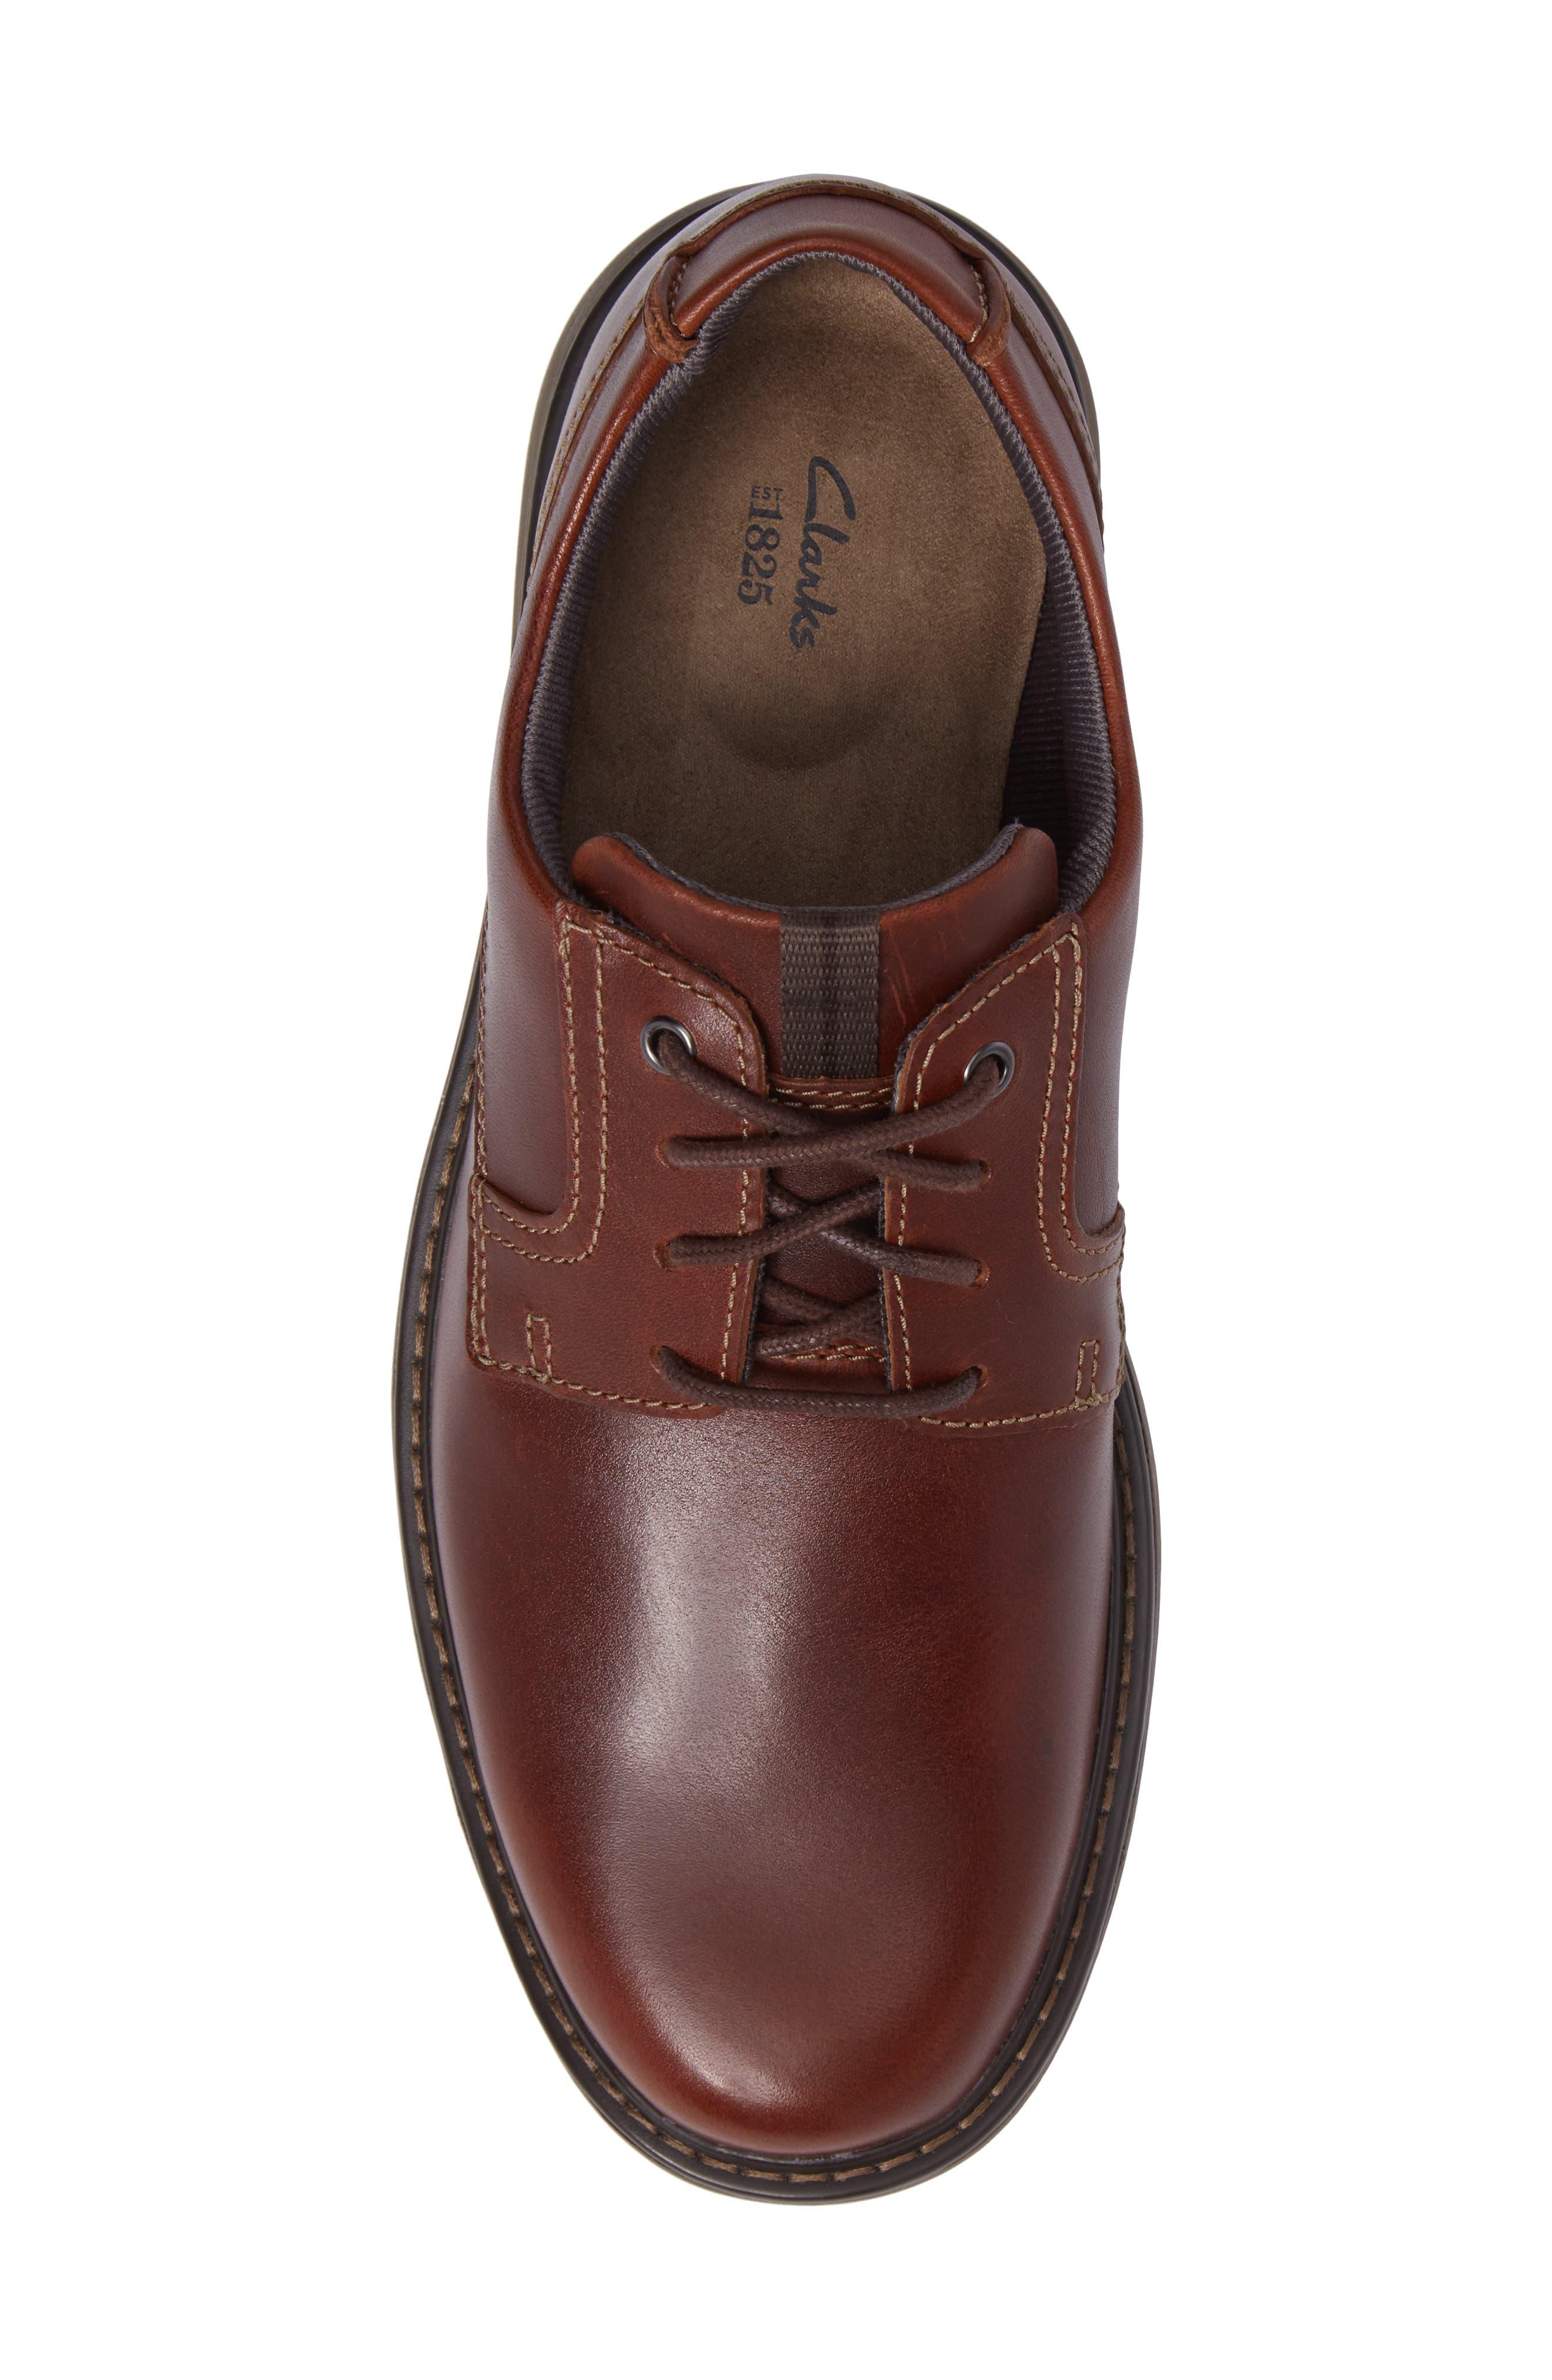 Cushox Plain Toe Derby,                             Alternate thumbnail 5, color,                             Dark Tan Leather